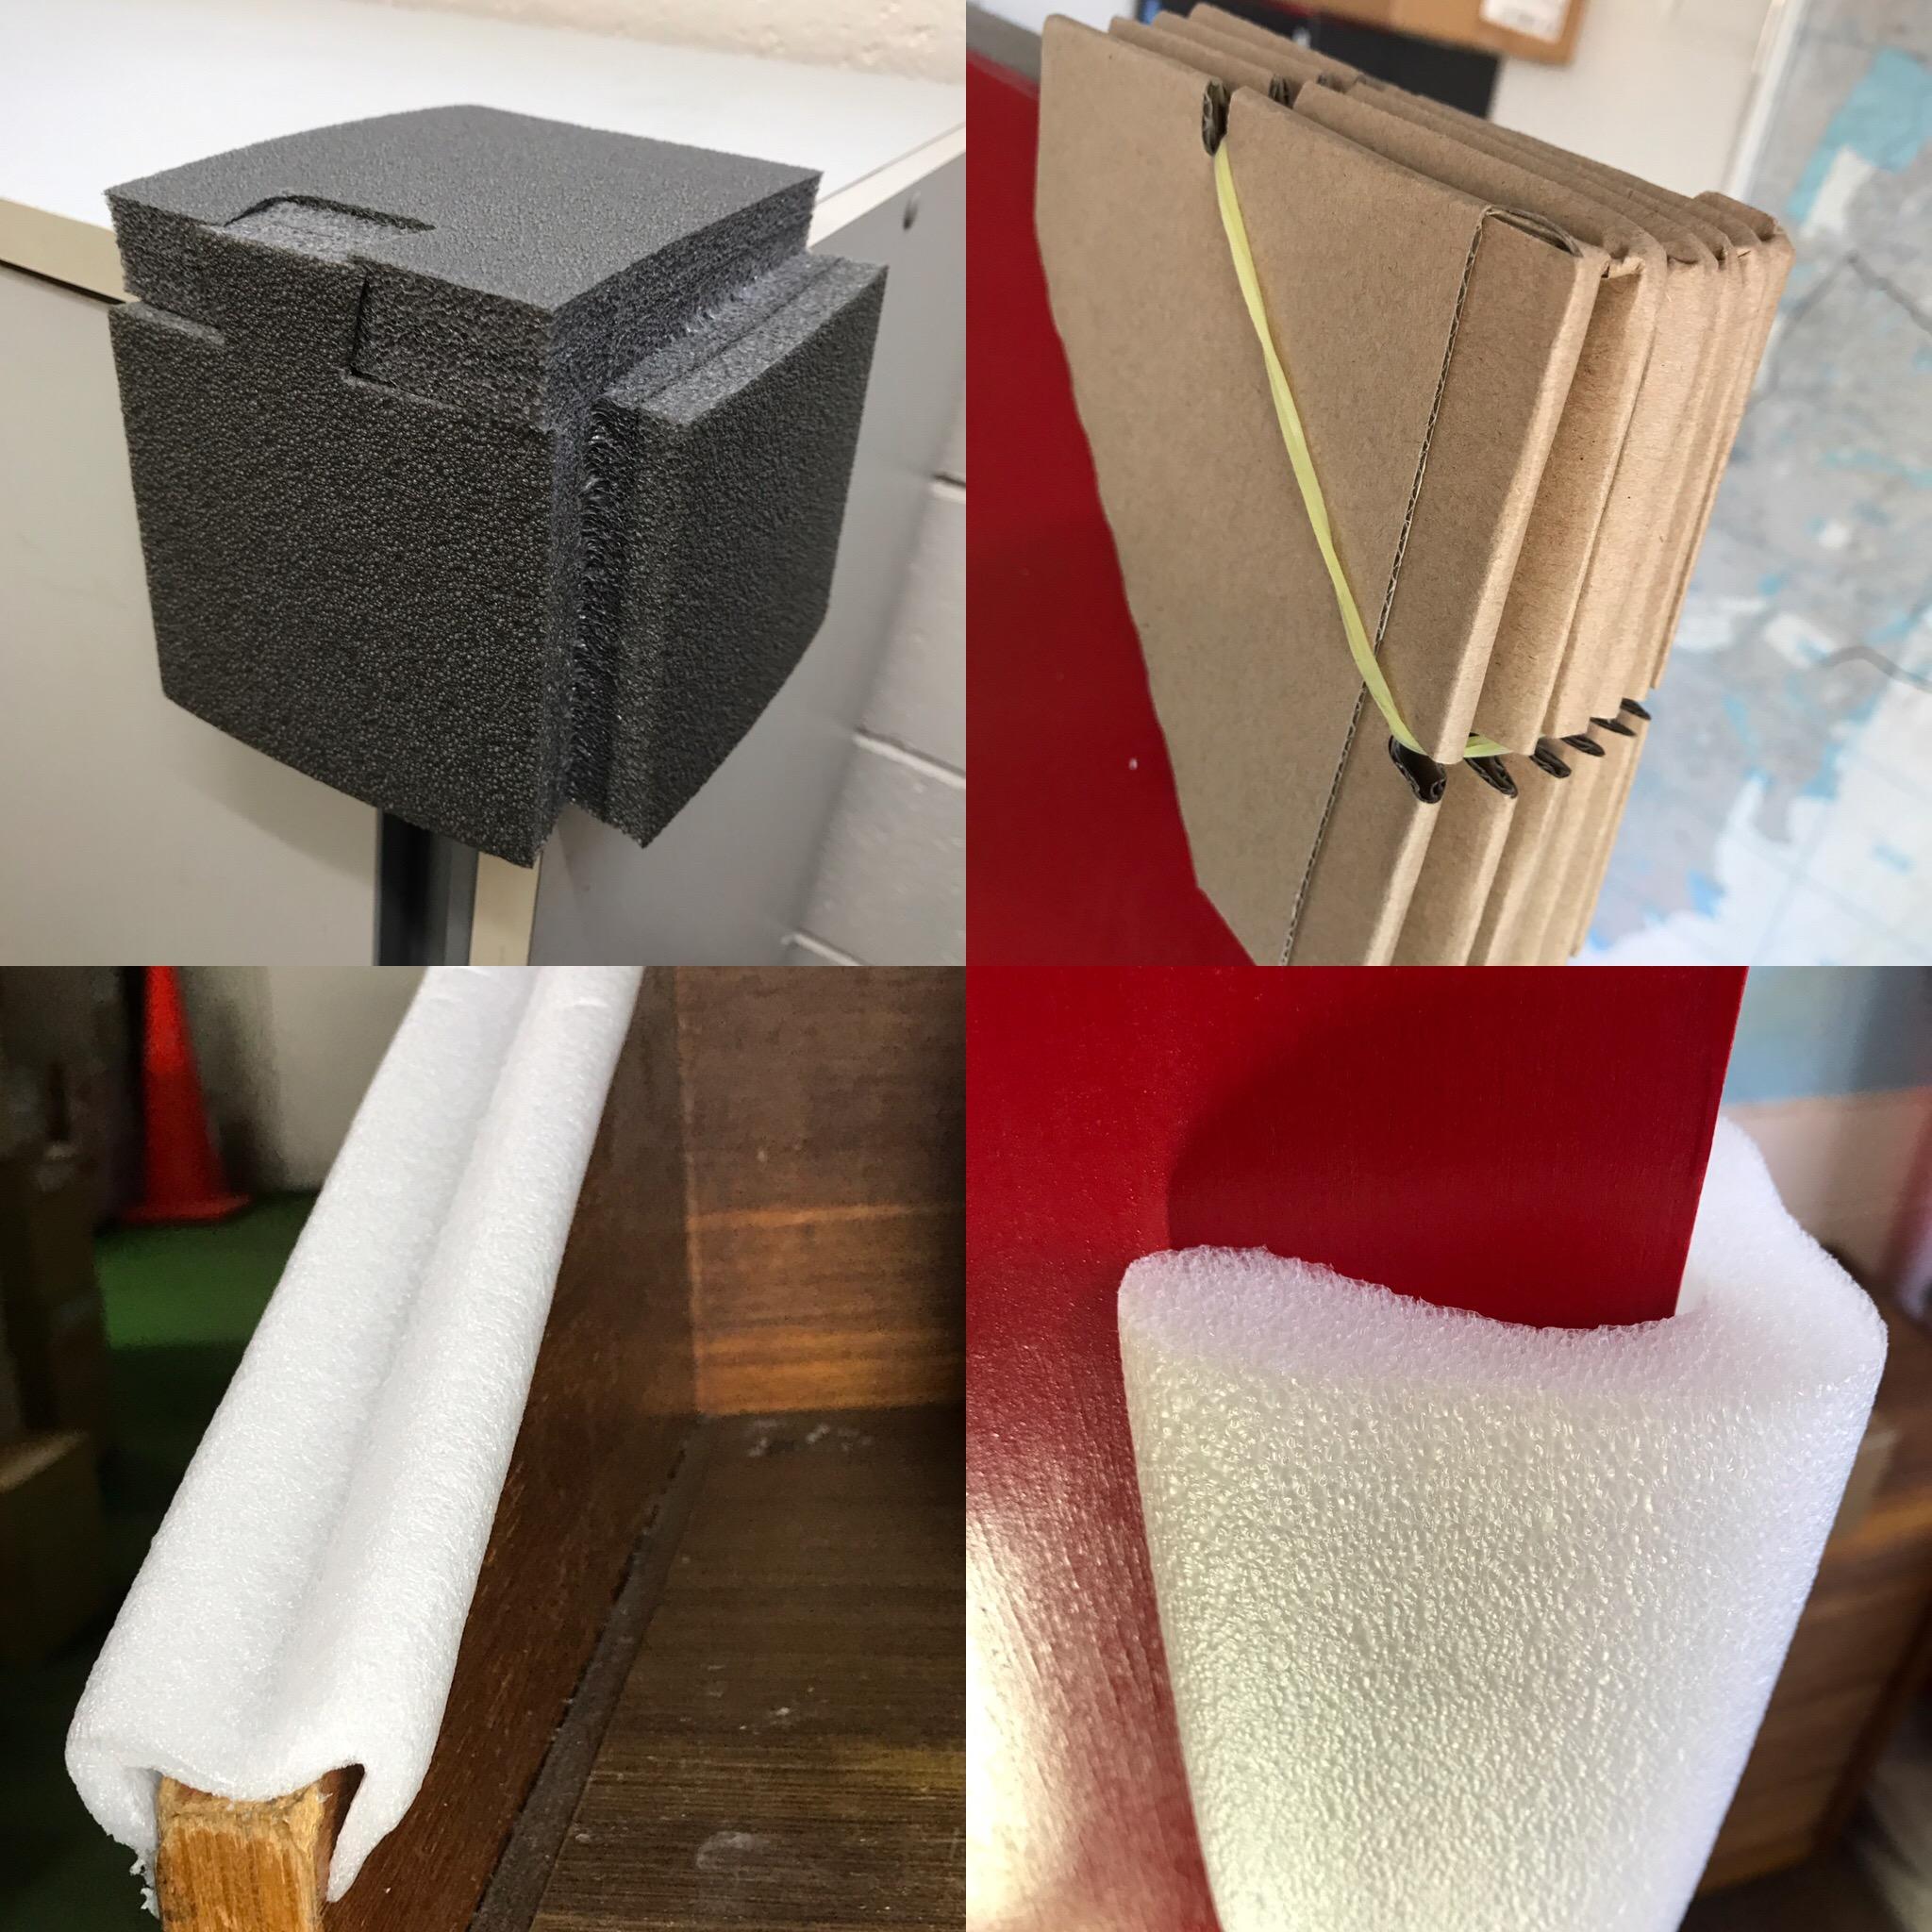 Edge & Corner Product Protection